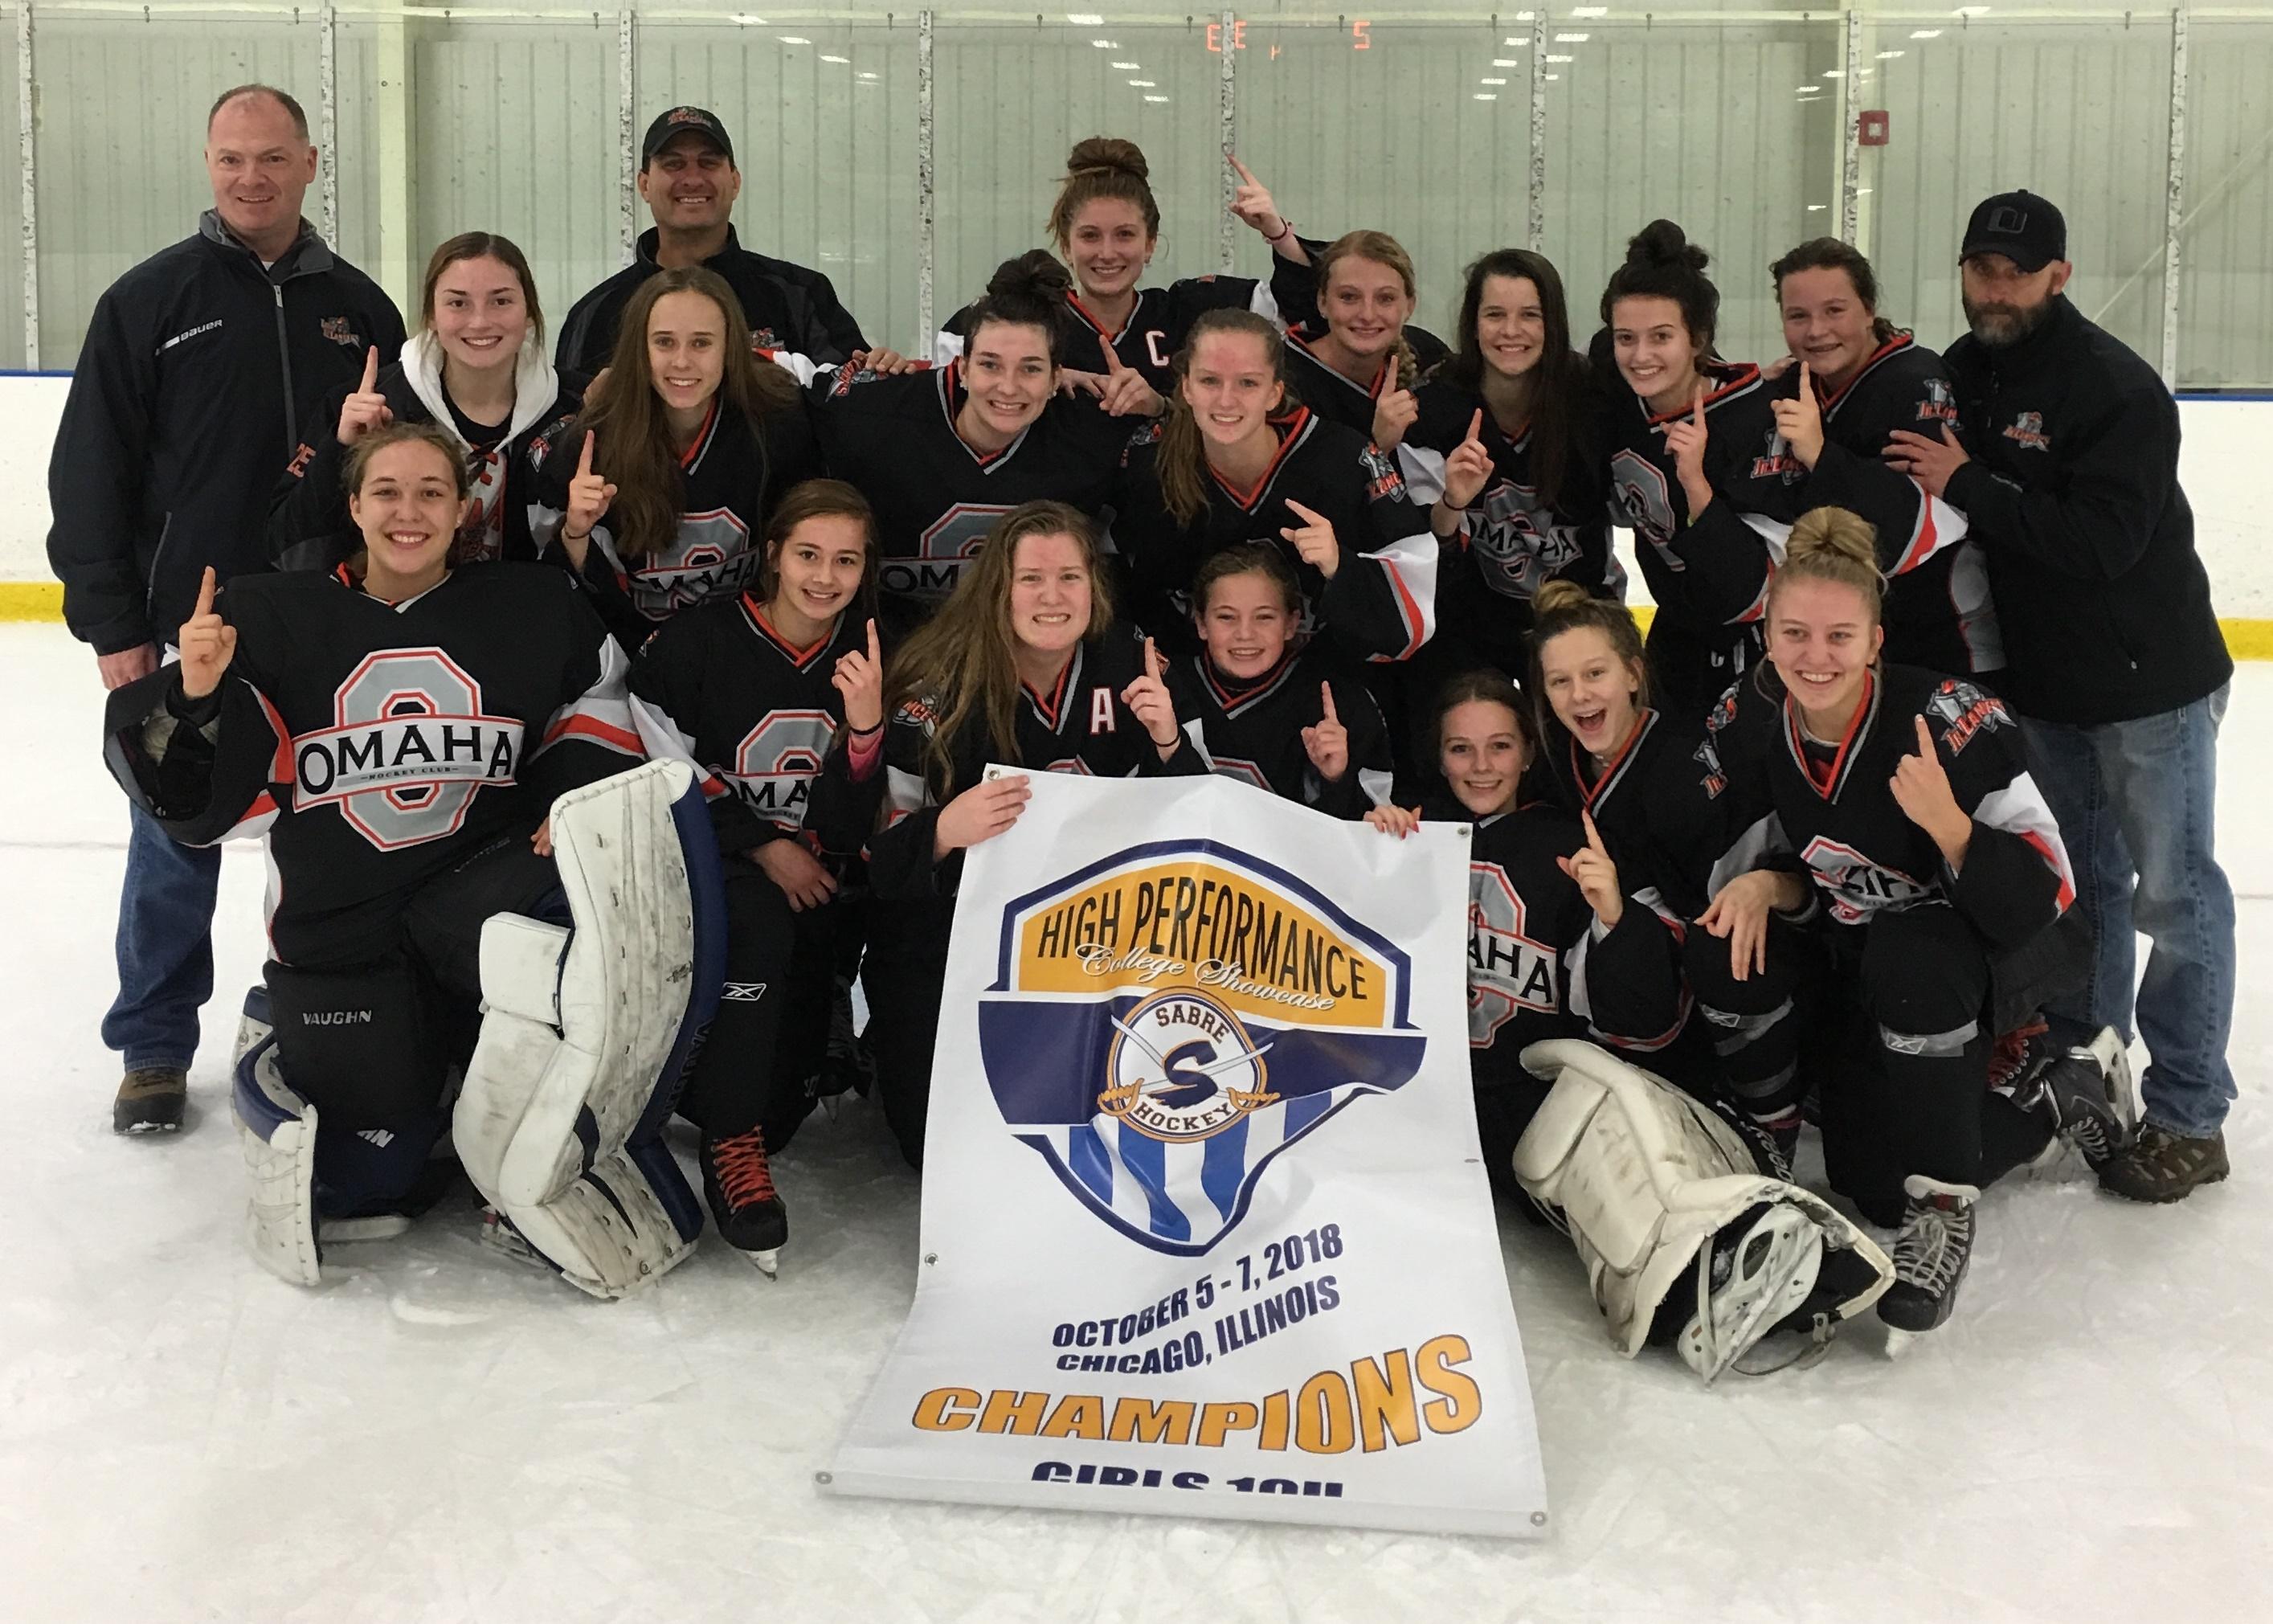 Naperville HPC Champions